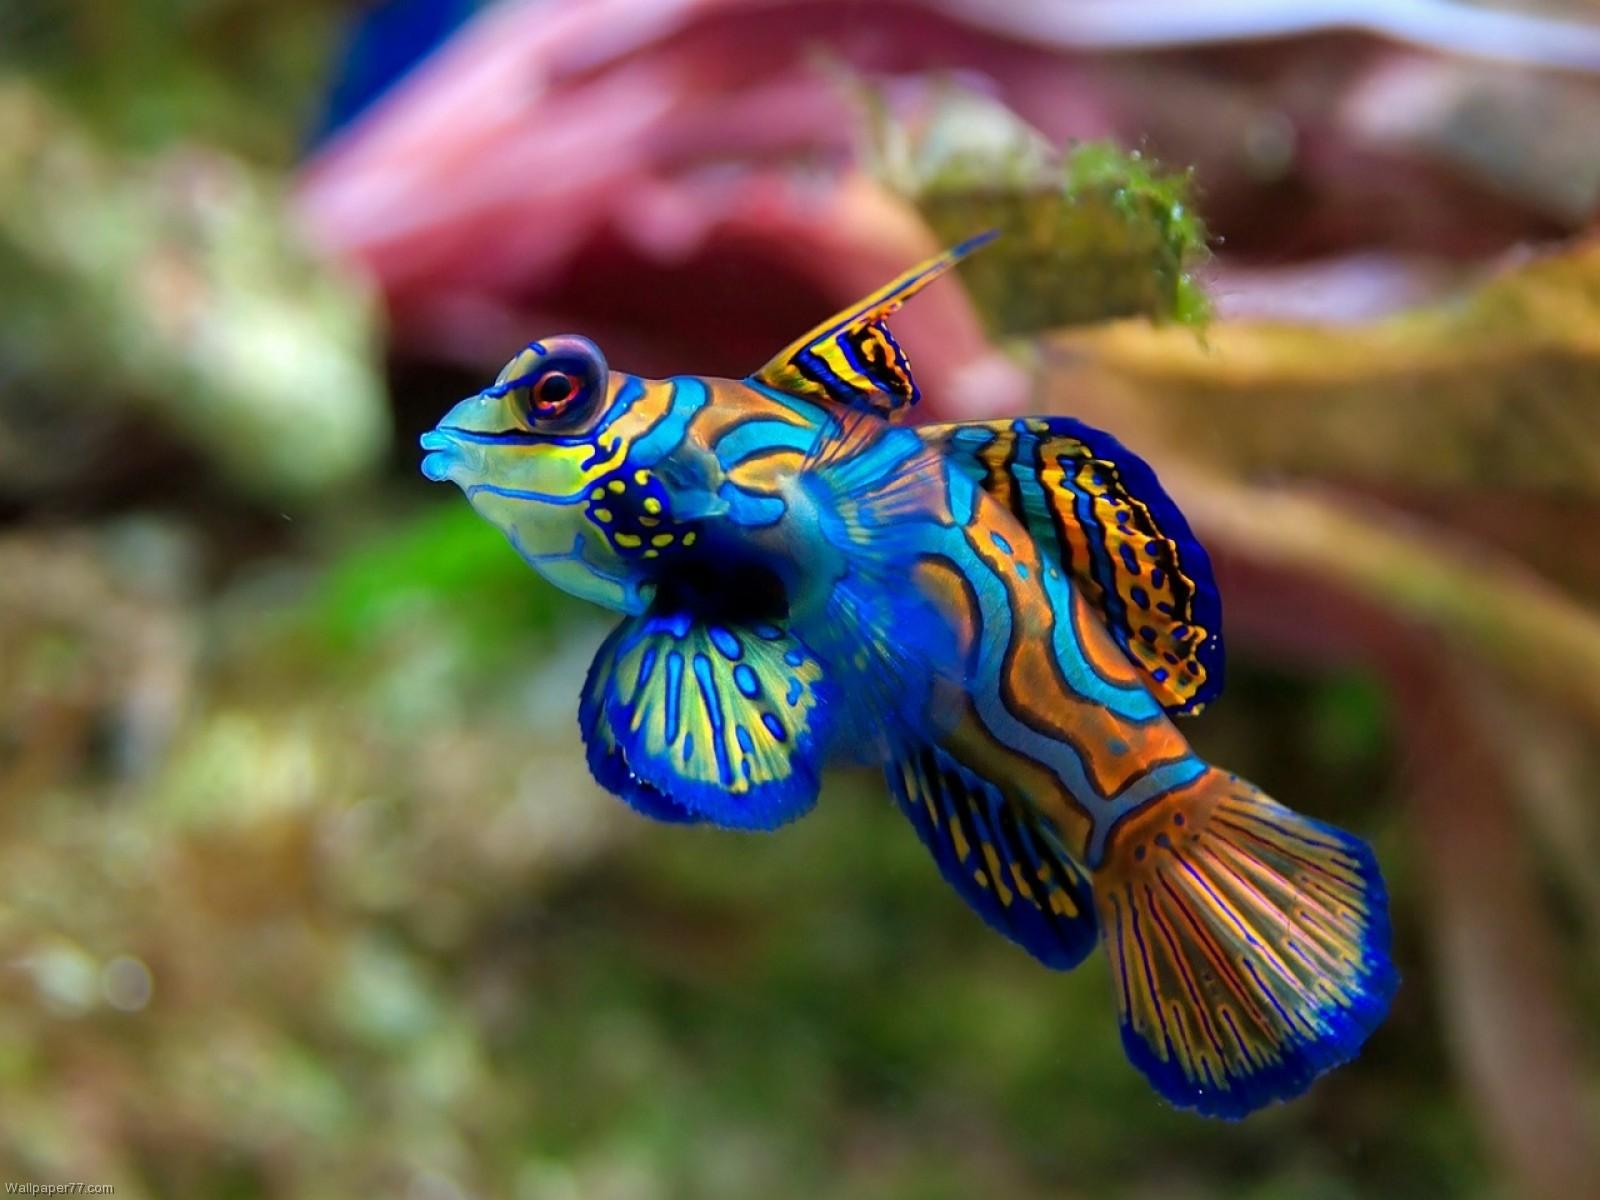 Wallpapers tagged Fish Wallpapers Ocean sea Underwater Water 1600x1200